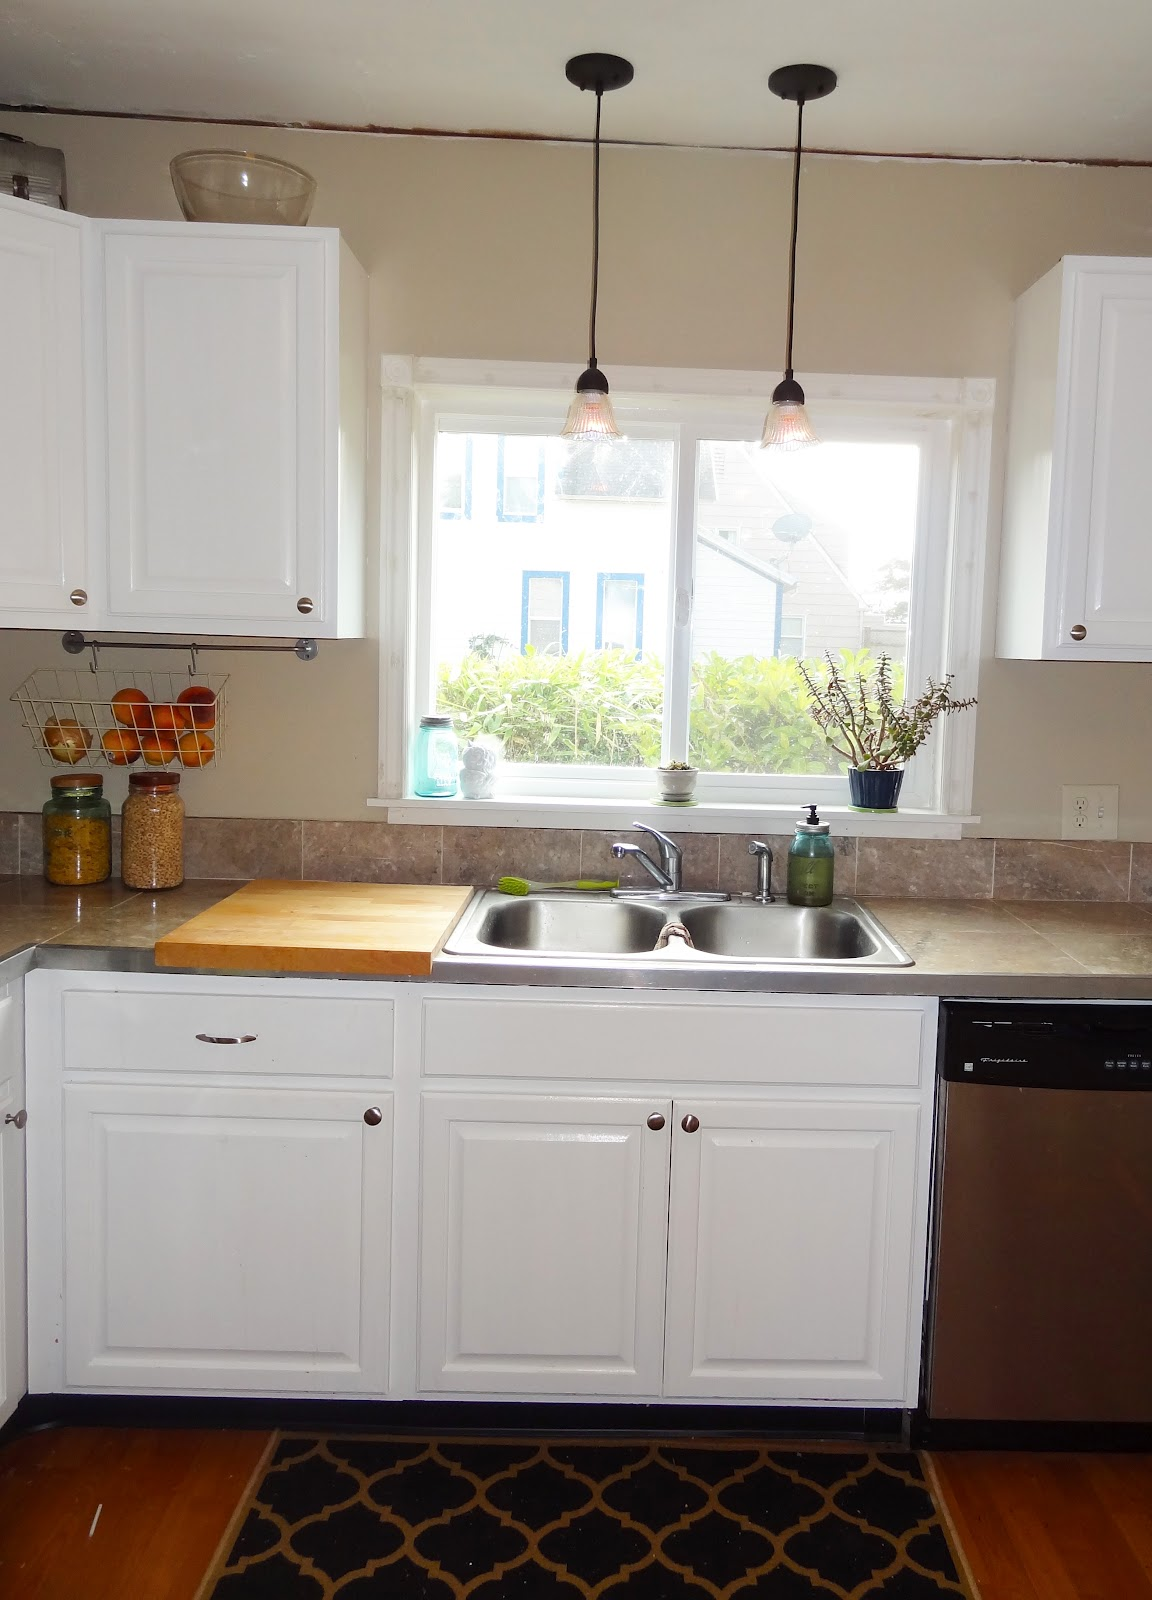 light it up update your kitchen kitchen light pendants DIY Update Your Kitchen Lighting on the Cheap